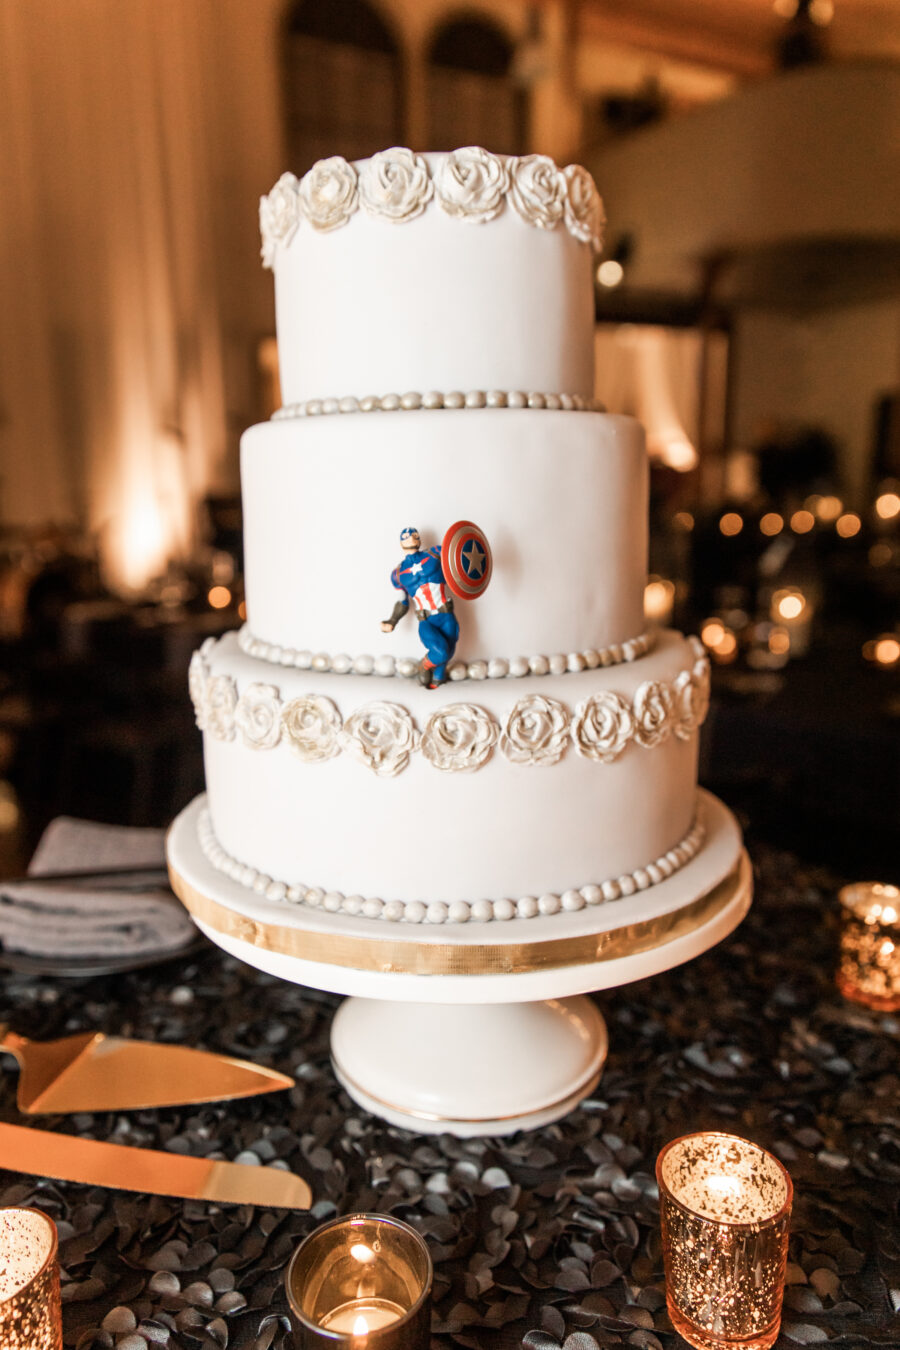 Winter wedding cake design: Nashville Wish Upon a Wedding captured by Nyk + Cali Photography featured on Nashville Bride Guide